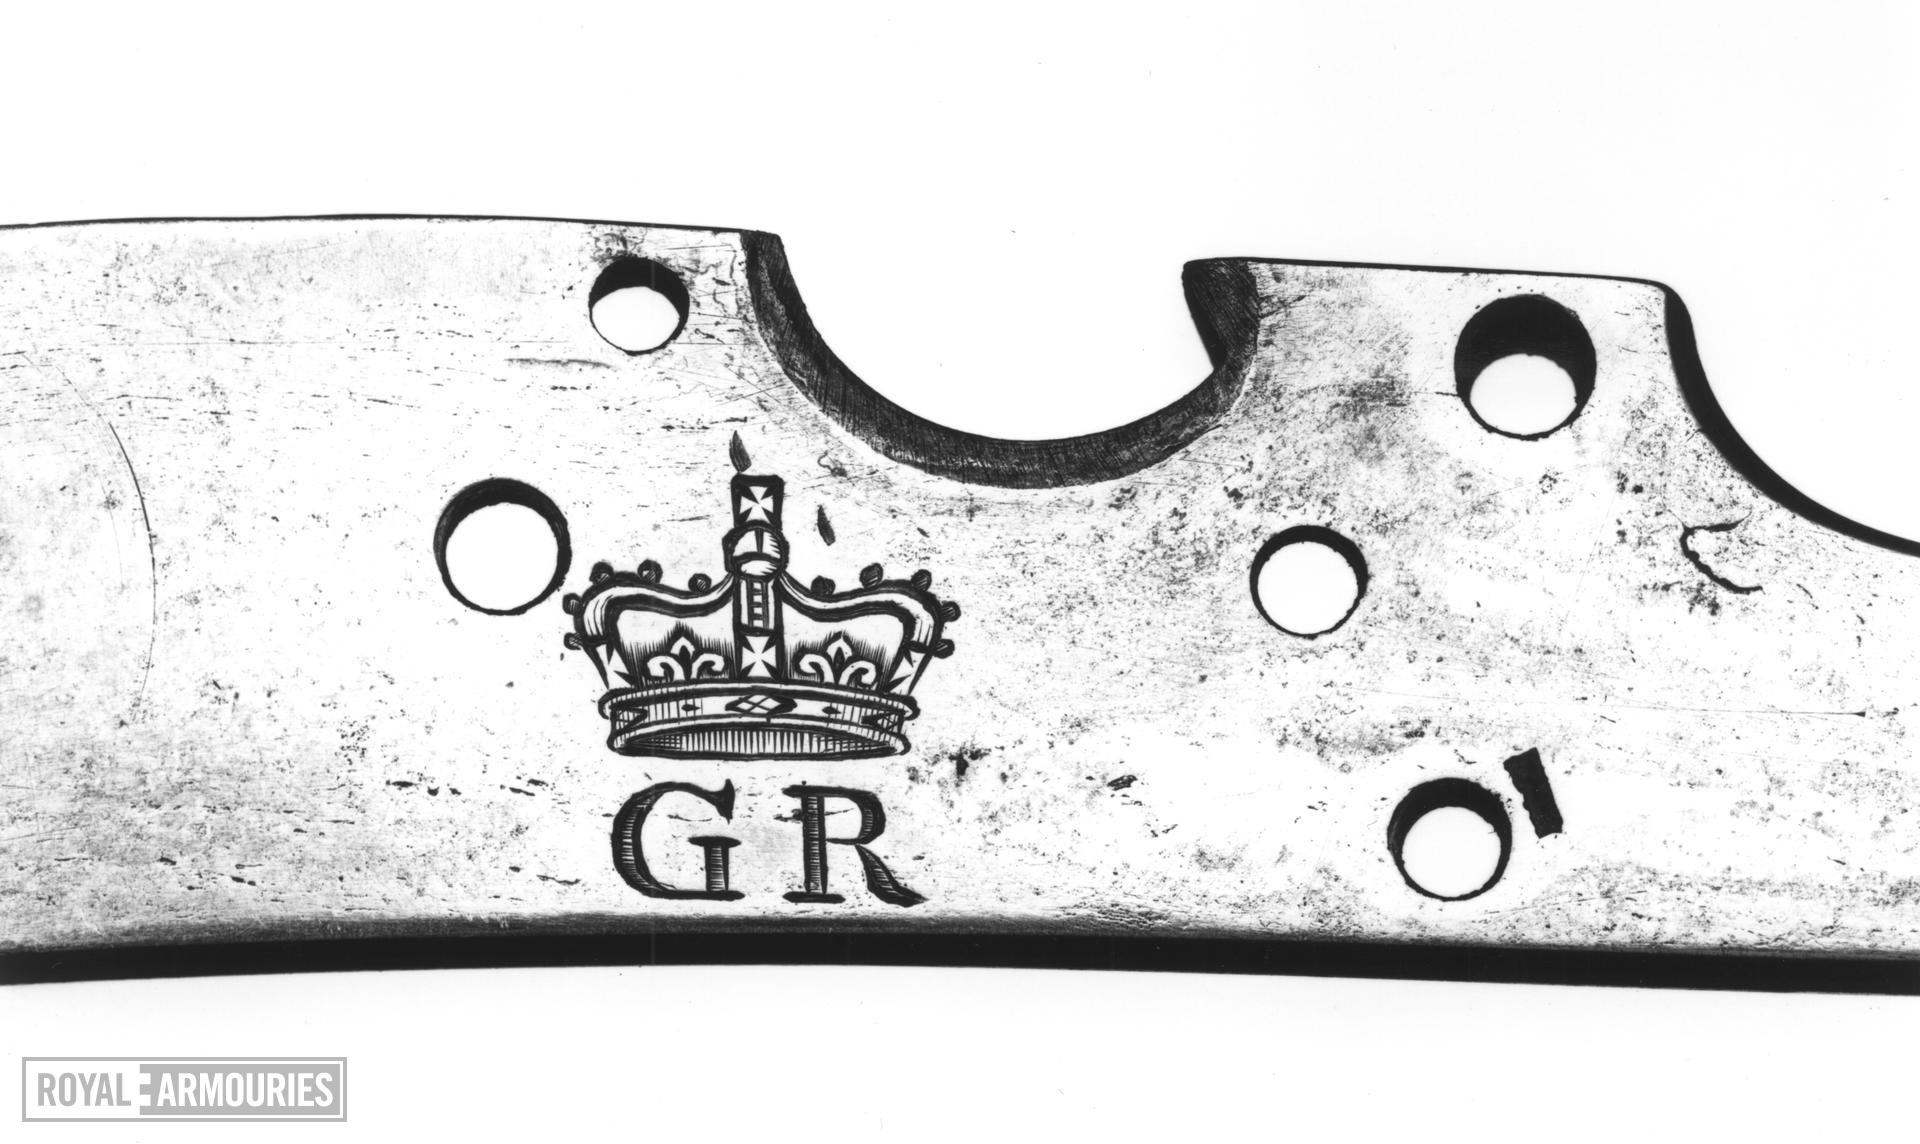 Flintlock muzzle-loading musketoon - Pattern 1704 Sea Service? Probably for Sea Service.